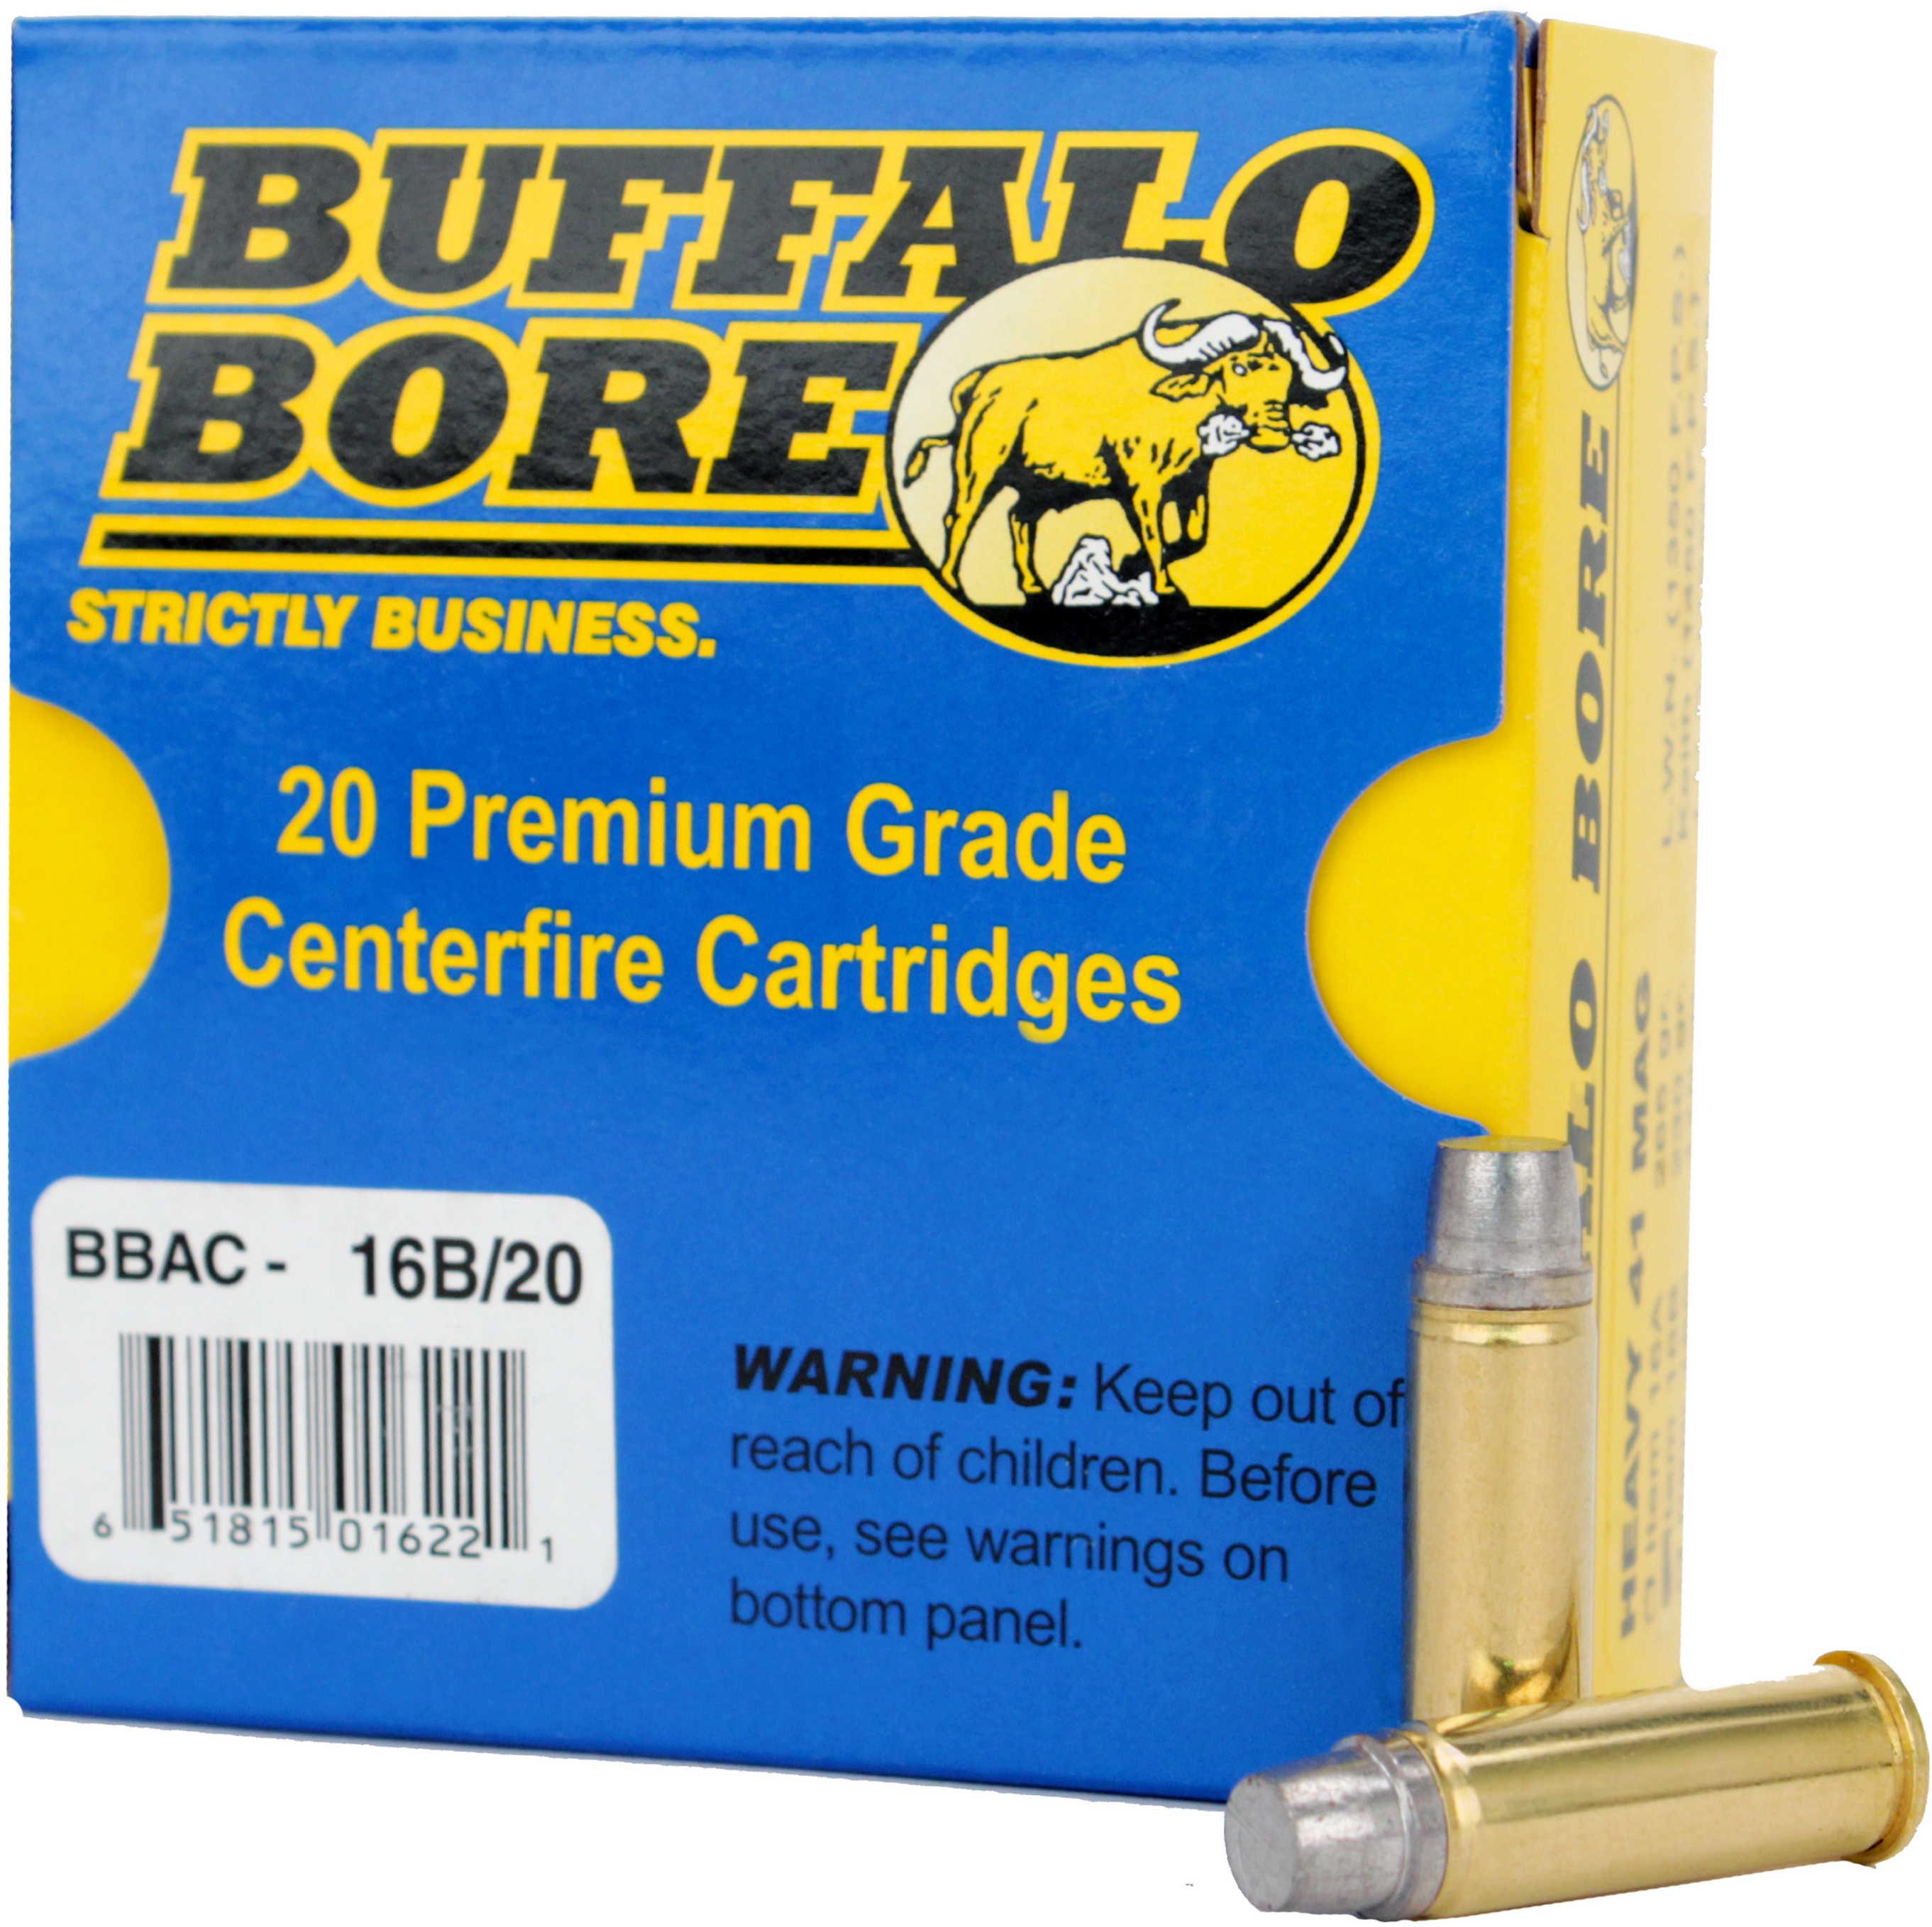 Buffalo Bore Ammunition Handgun 41 Rem Mag Hard Cast 230 Grains 20 Rounds Per Box 16B/20